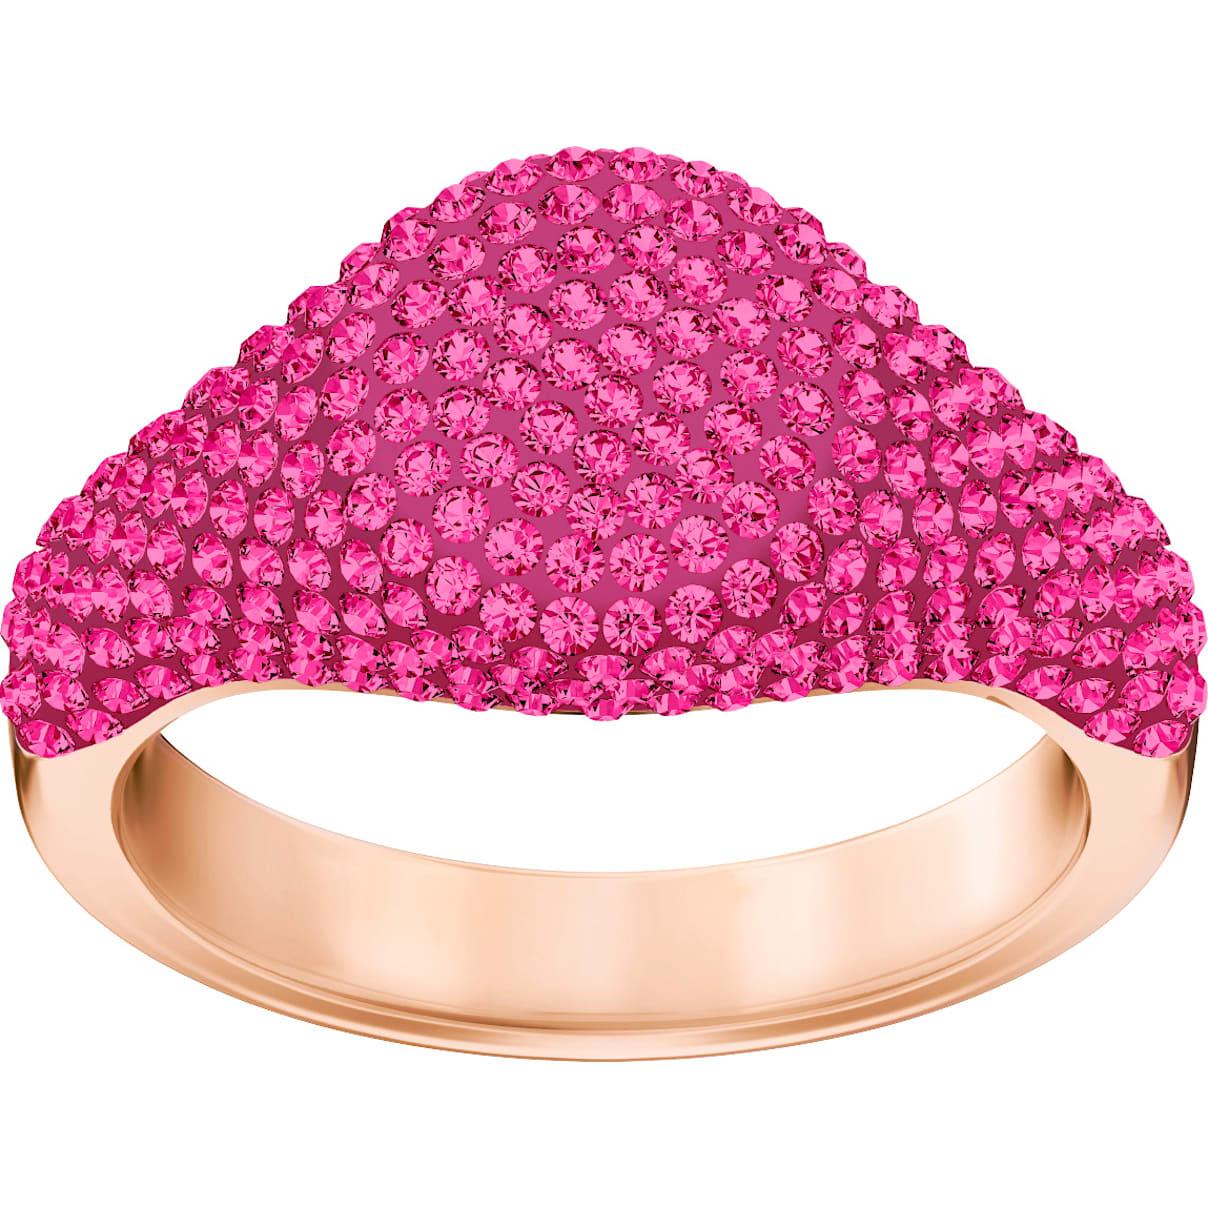 Swarovski Stone Signet Ring, Pink, Rose-gold tone plated